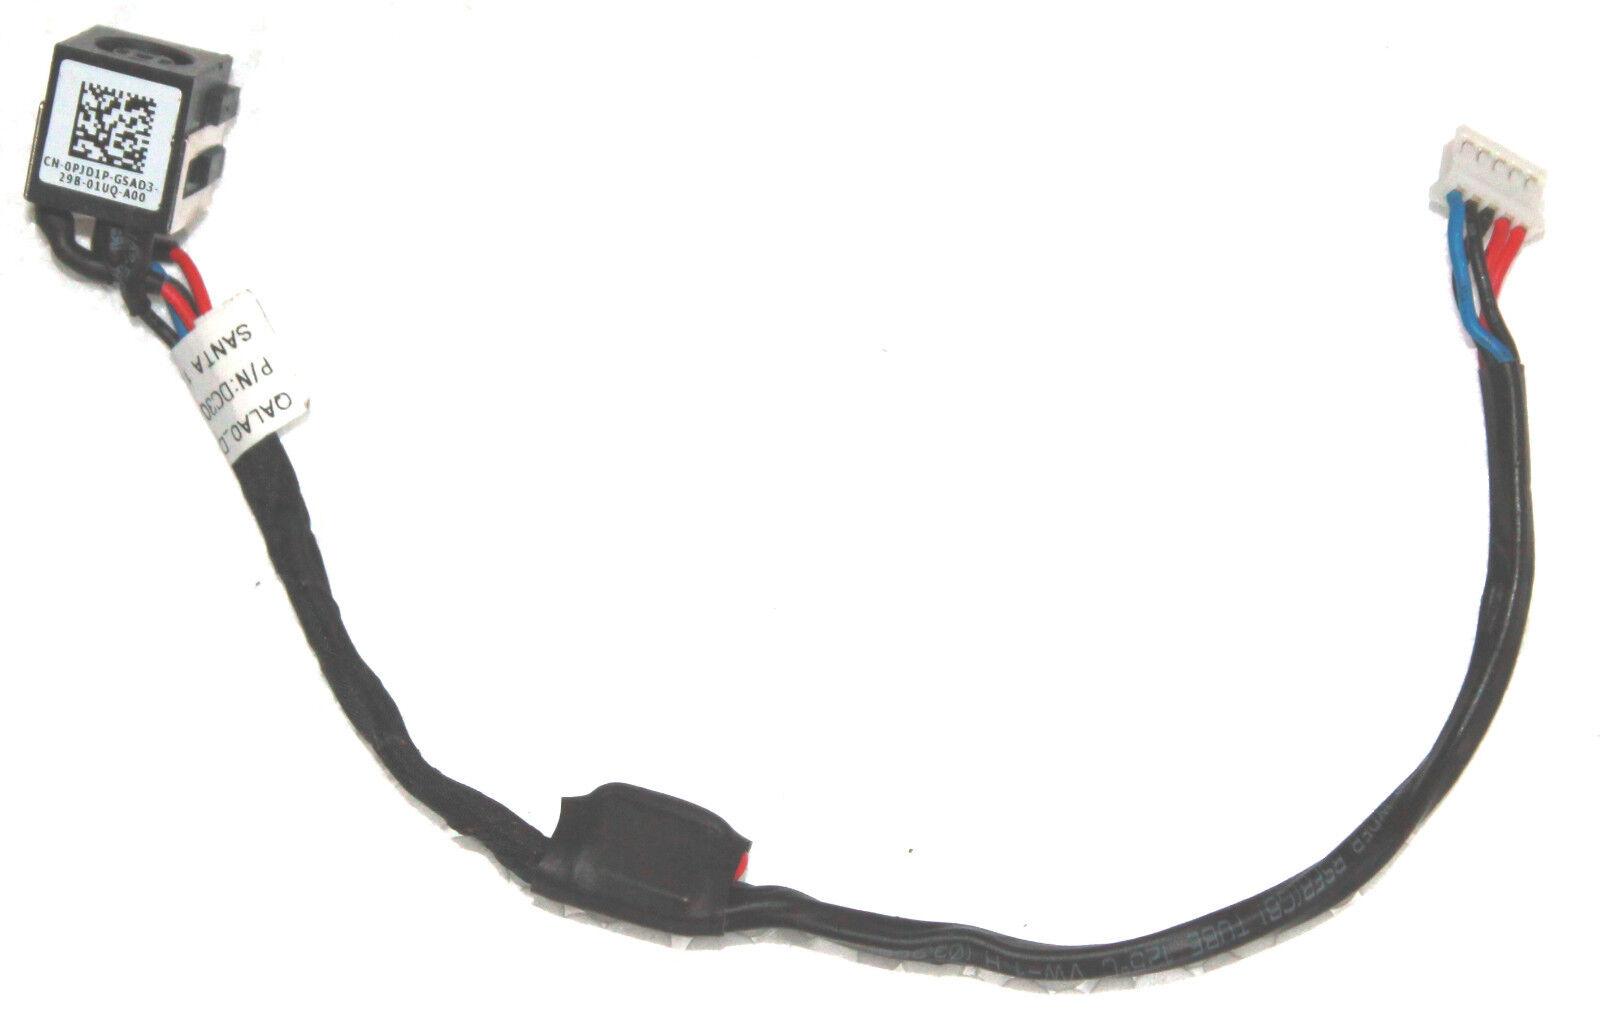 OEM Dell Latitude E6530 DC Power Input Jack Plug /& Five Pin Cable DC30100HH00